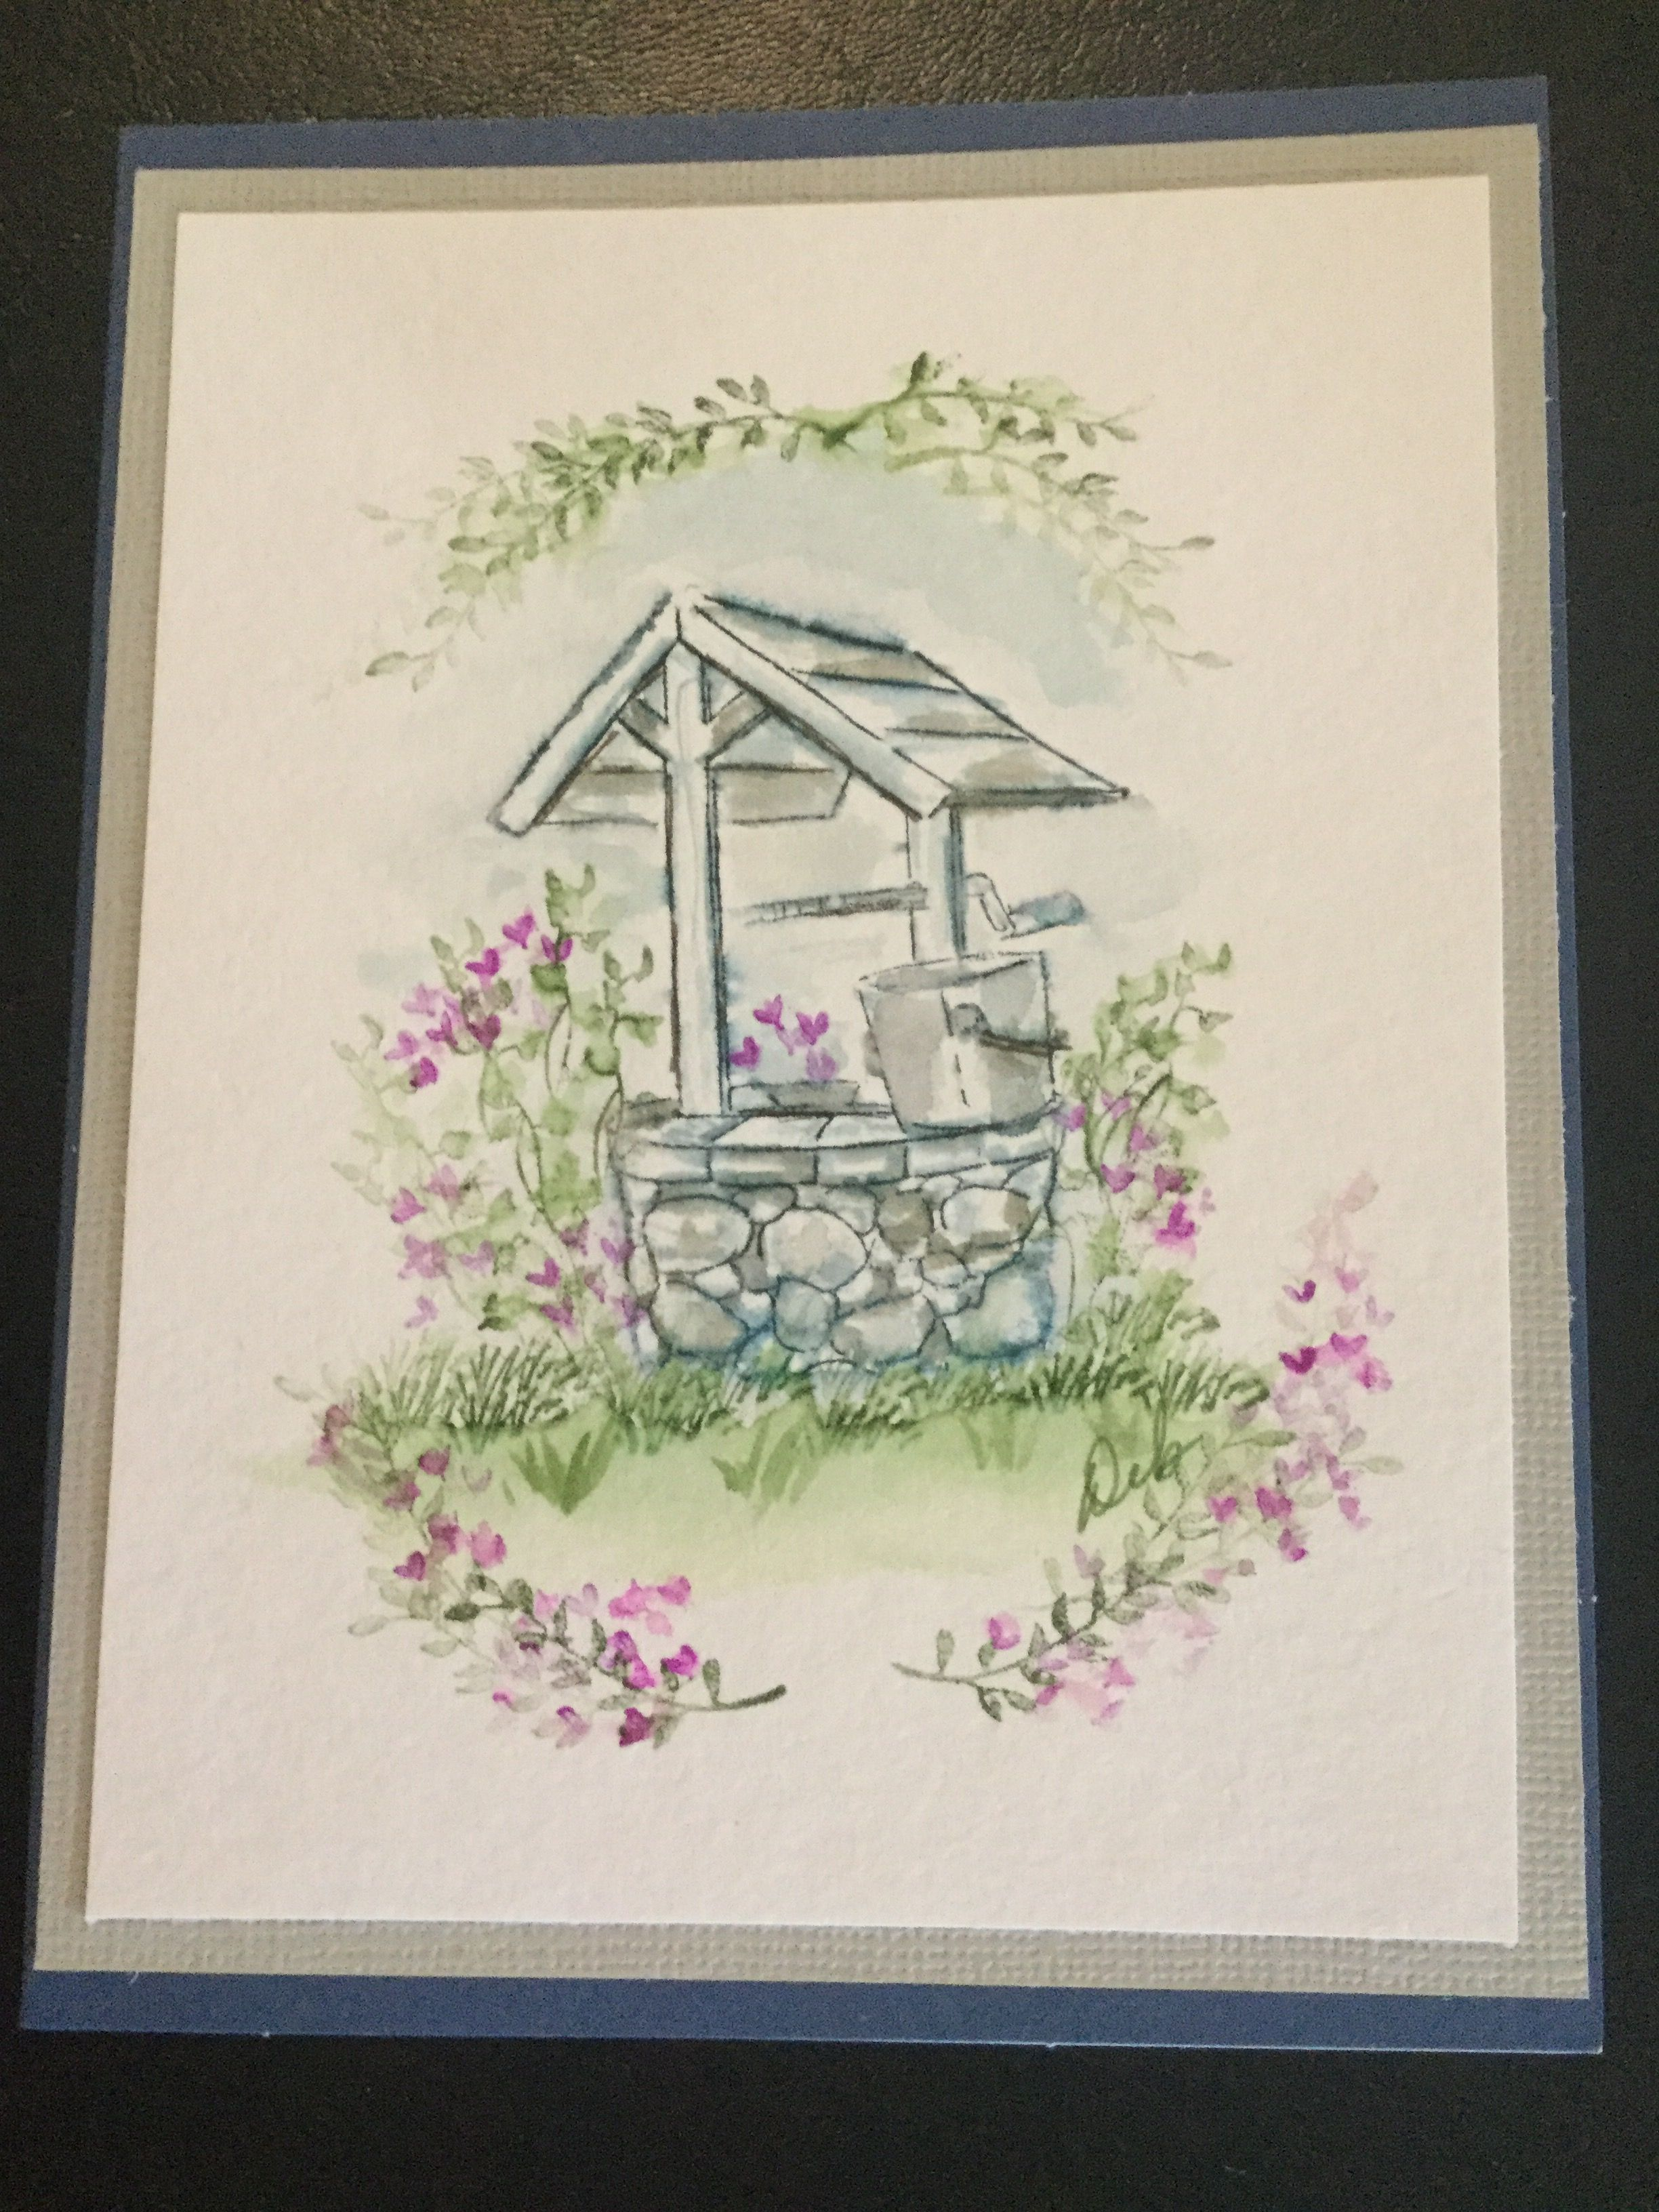 Rachel S Wishing Well Art Impressions Stamps Art Impressions